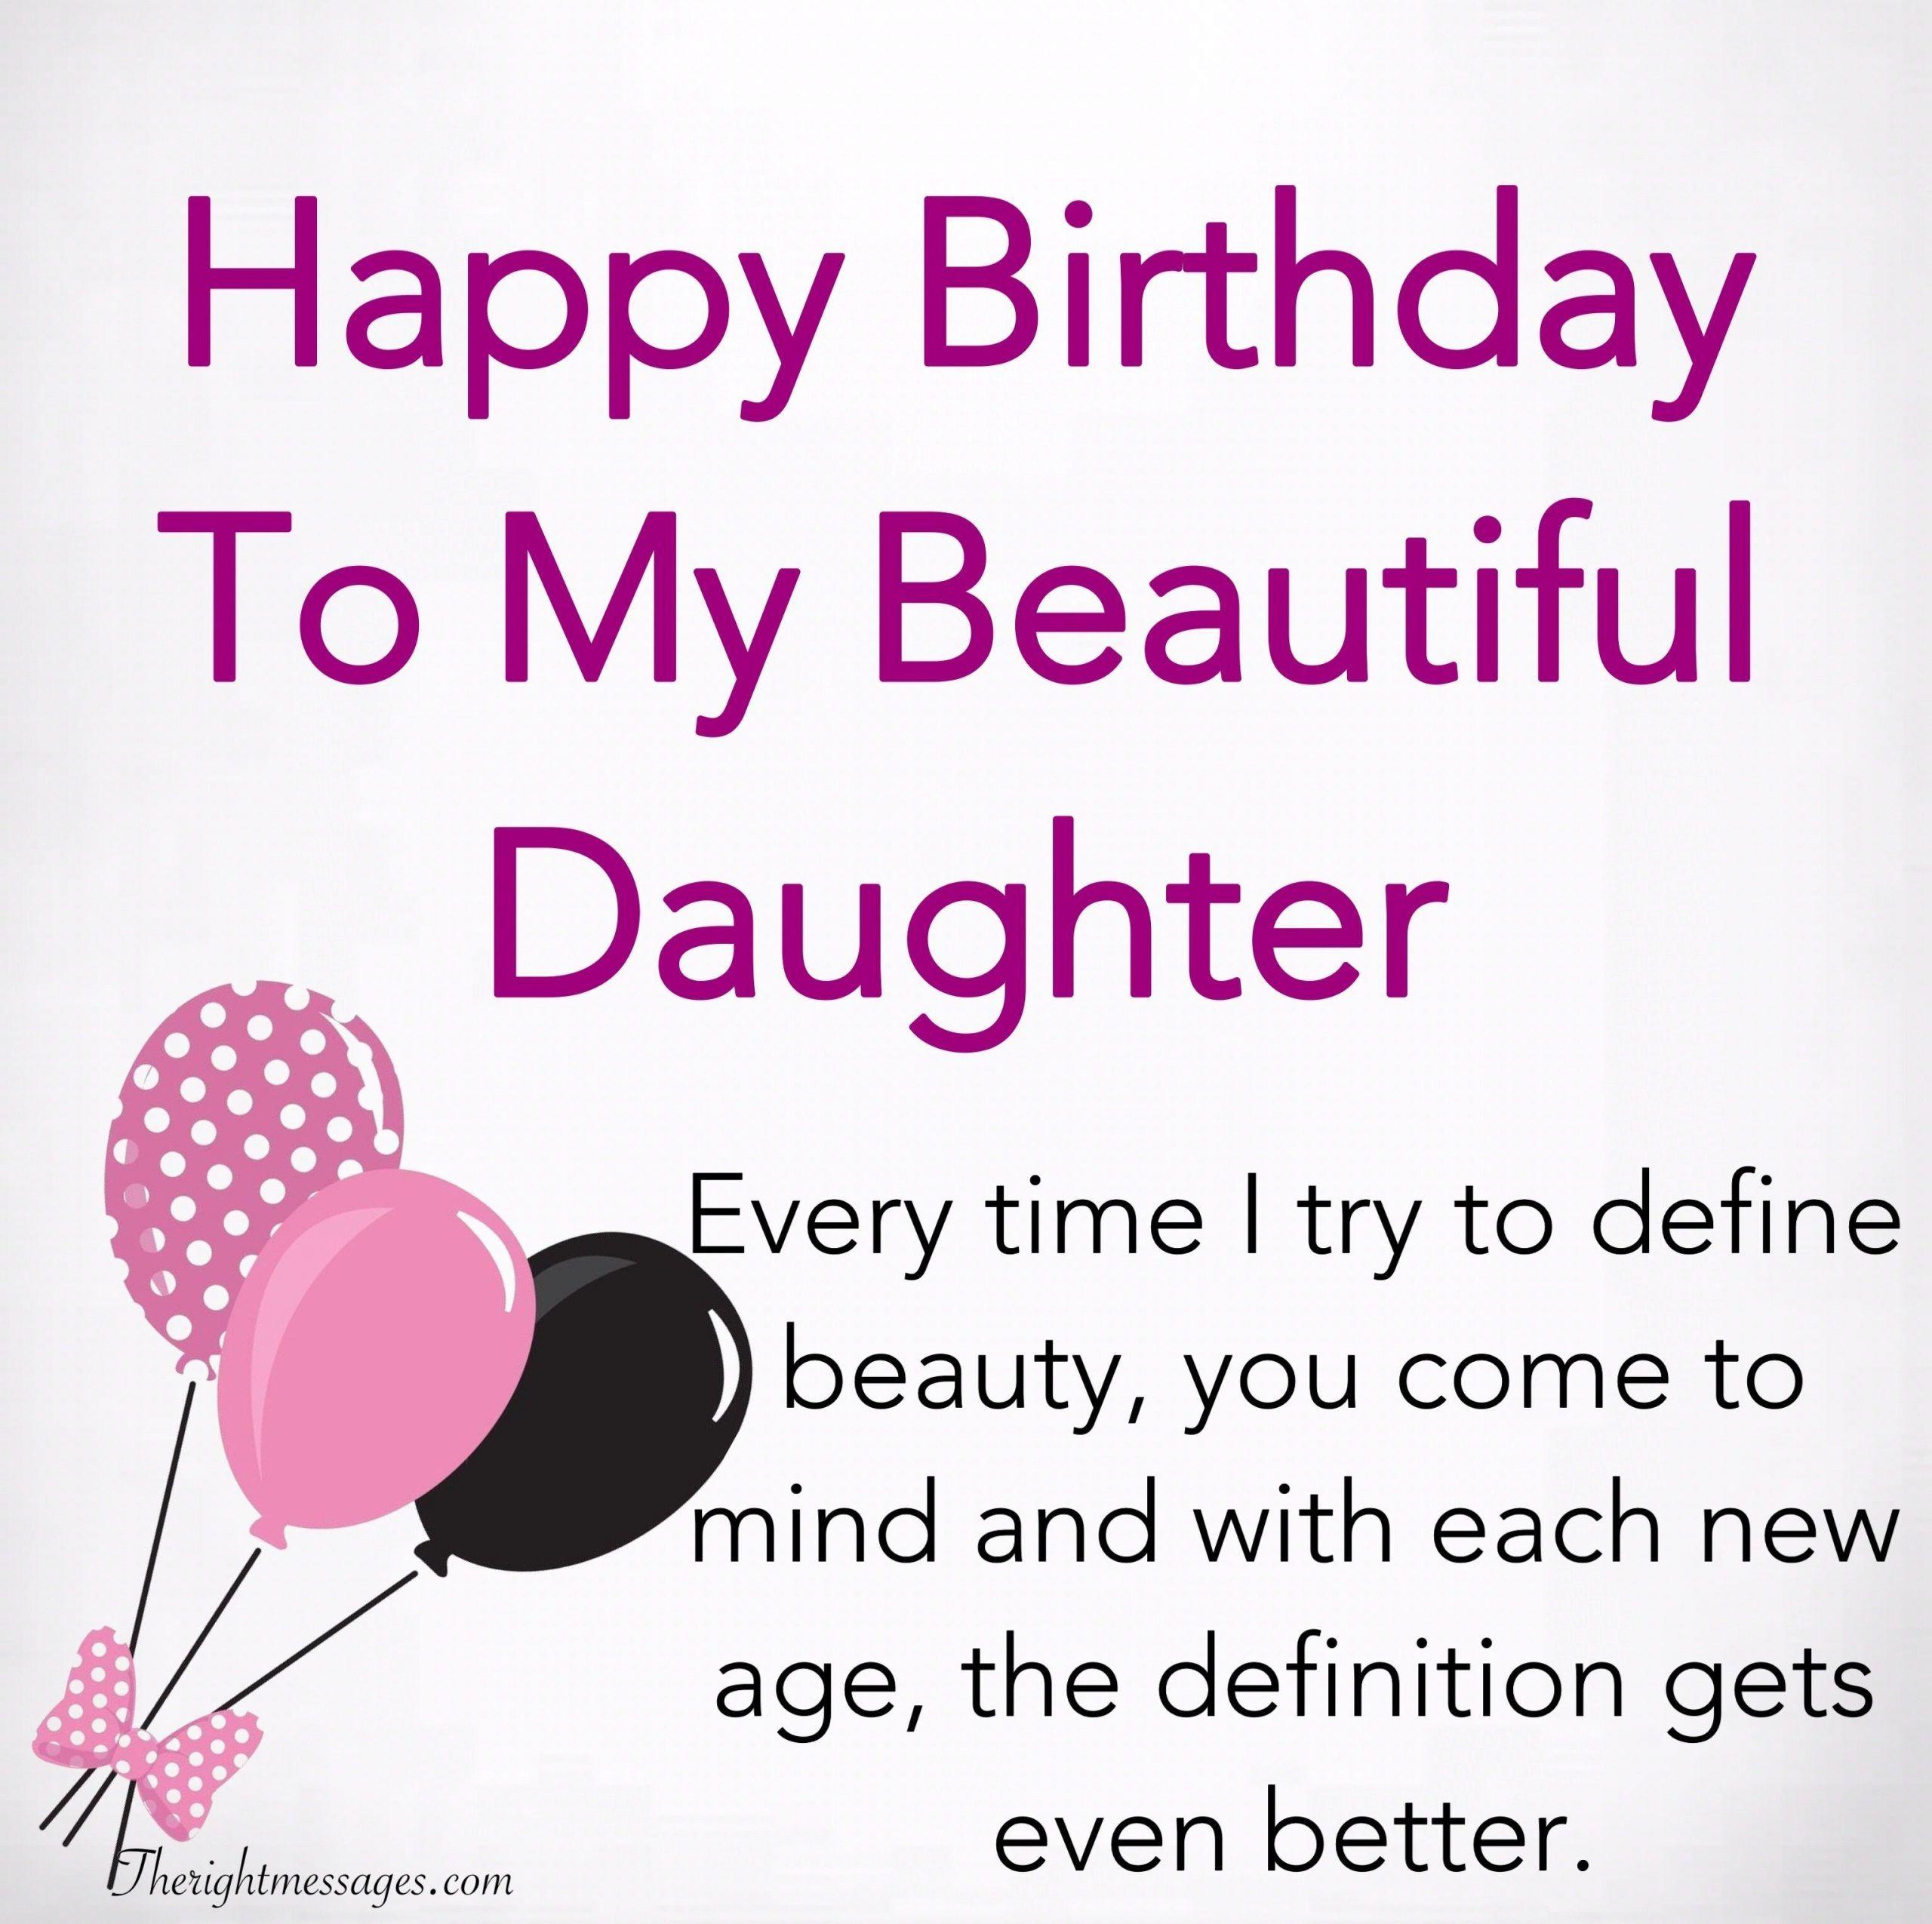 Happy Birthday To My Daughter Regarding Trending This Year In 2020